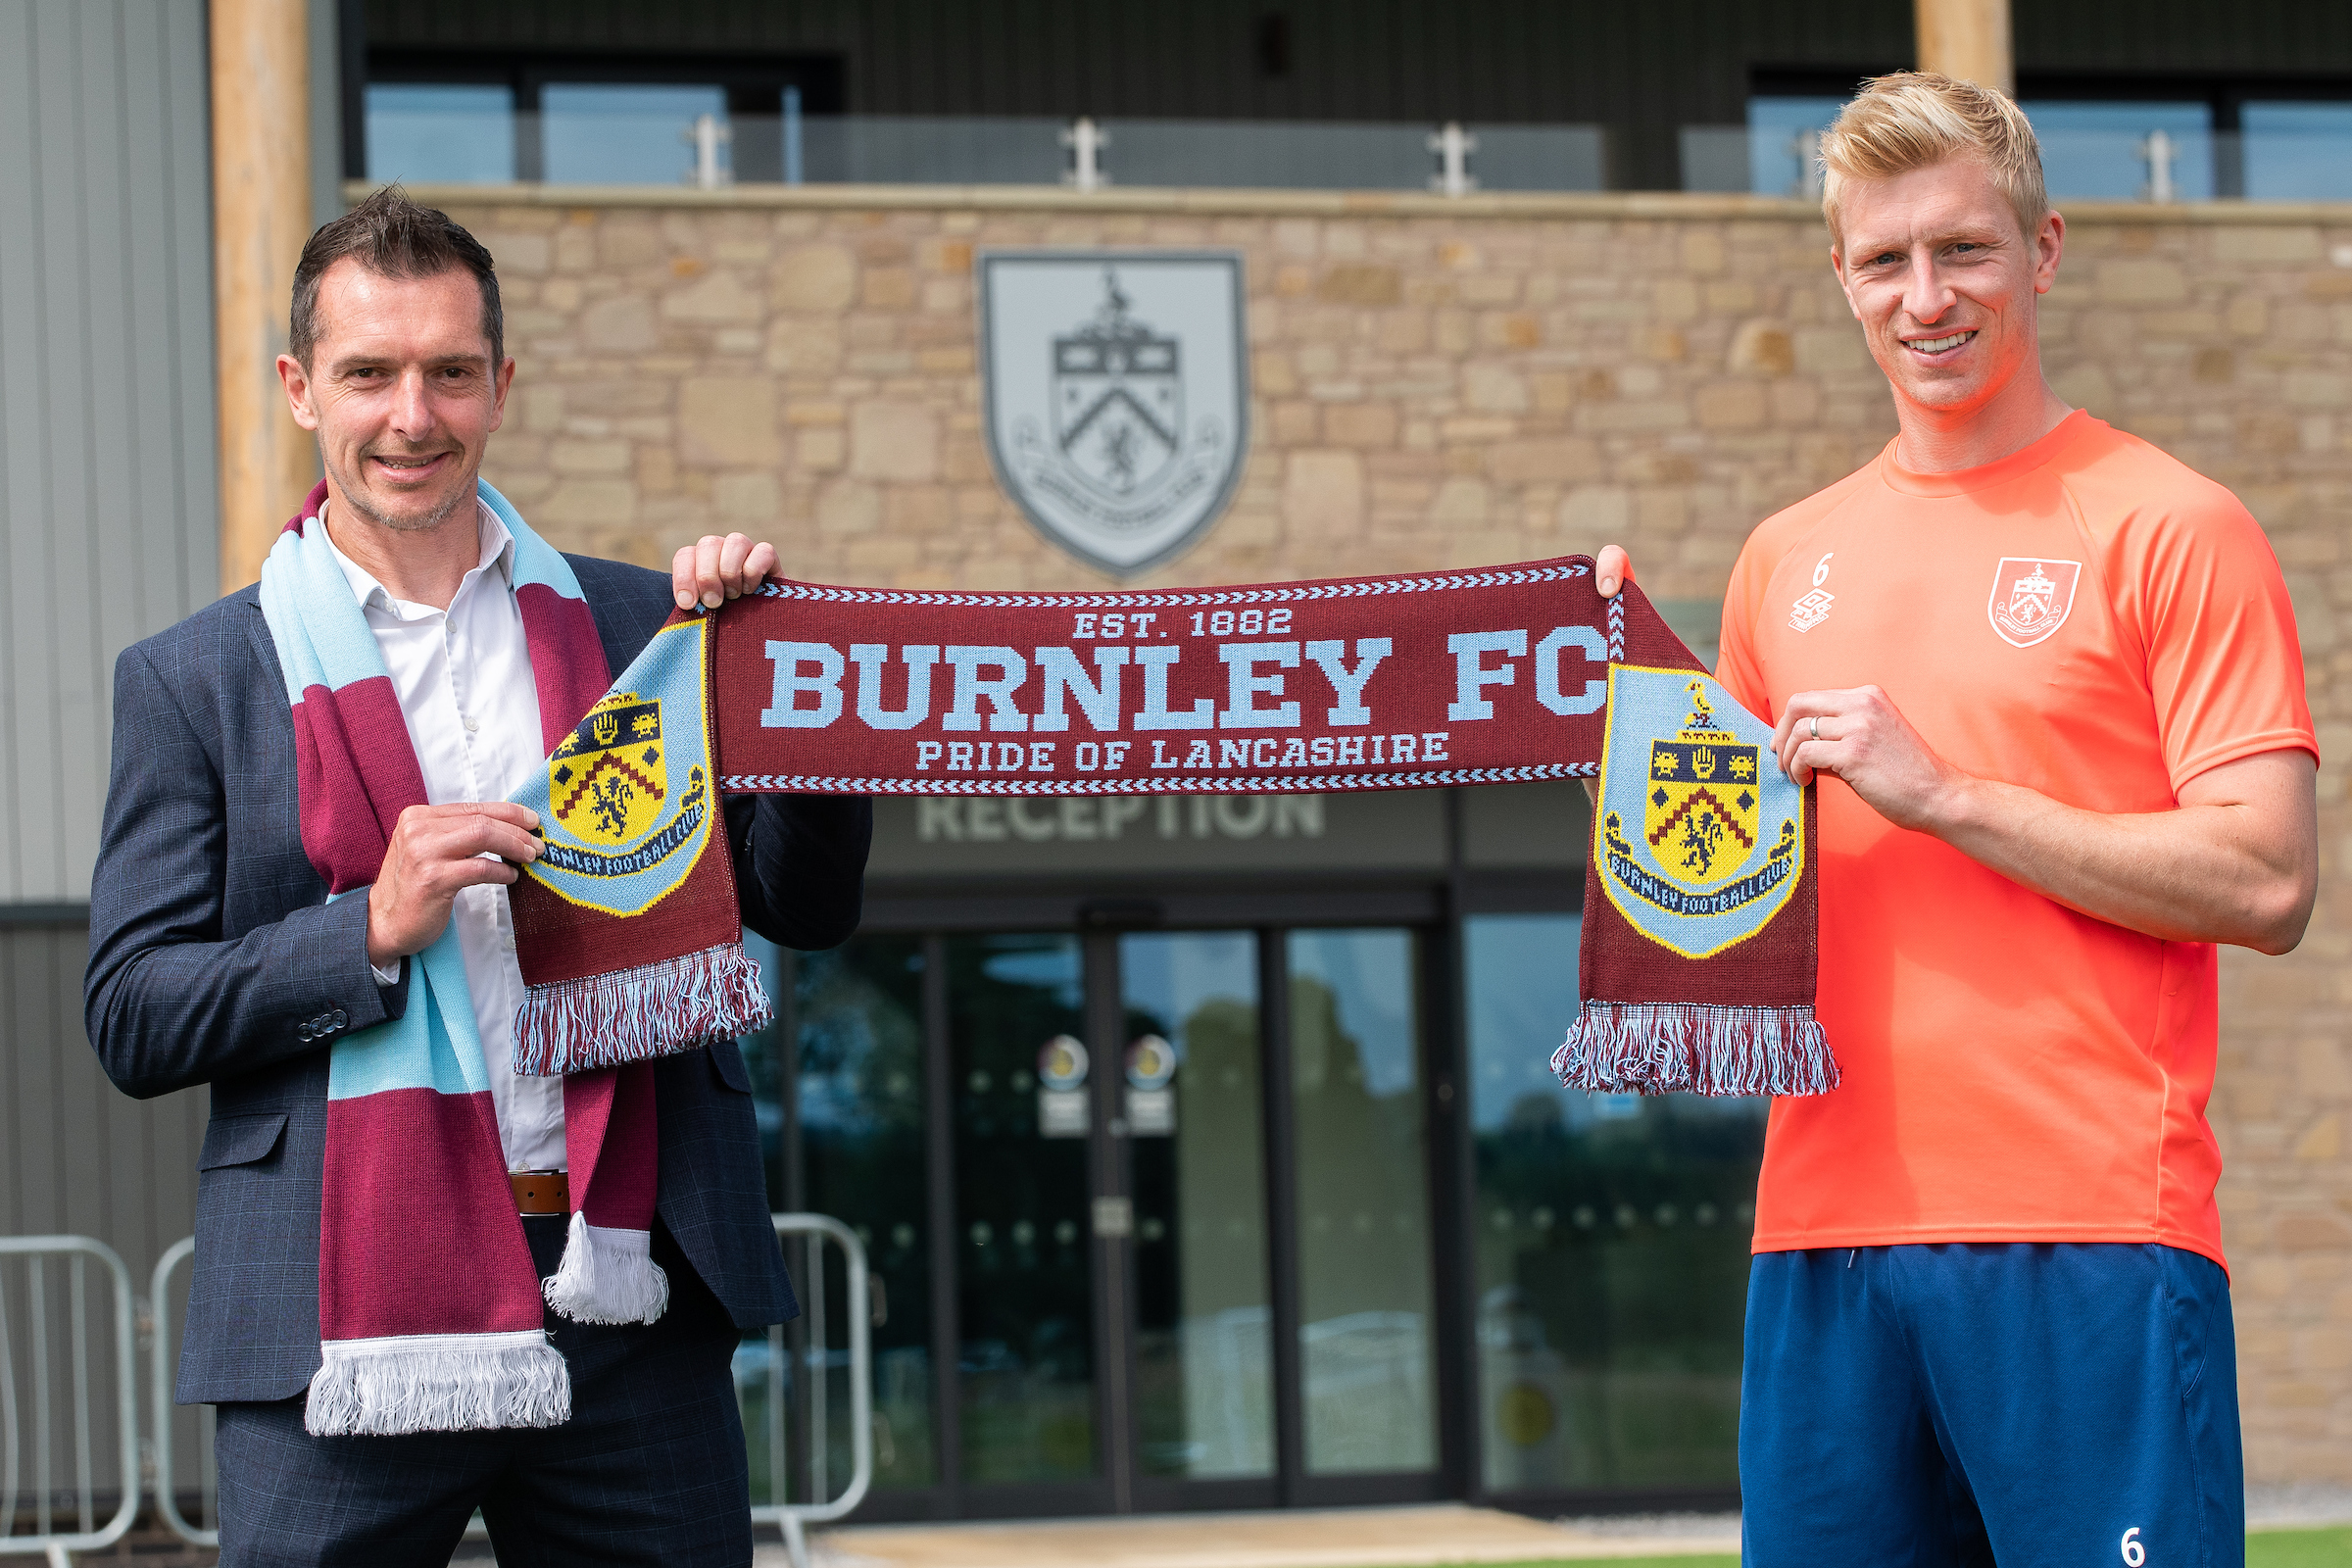 Burnley announce new principal shirt sponsor for 2021/22 season